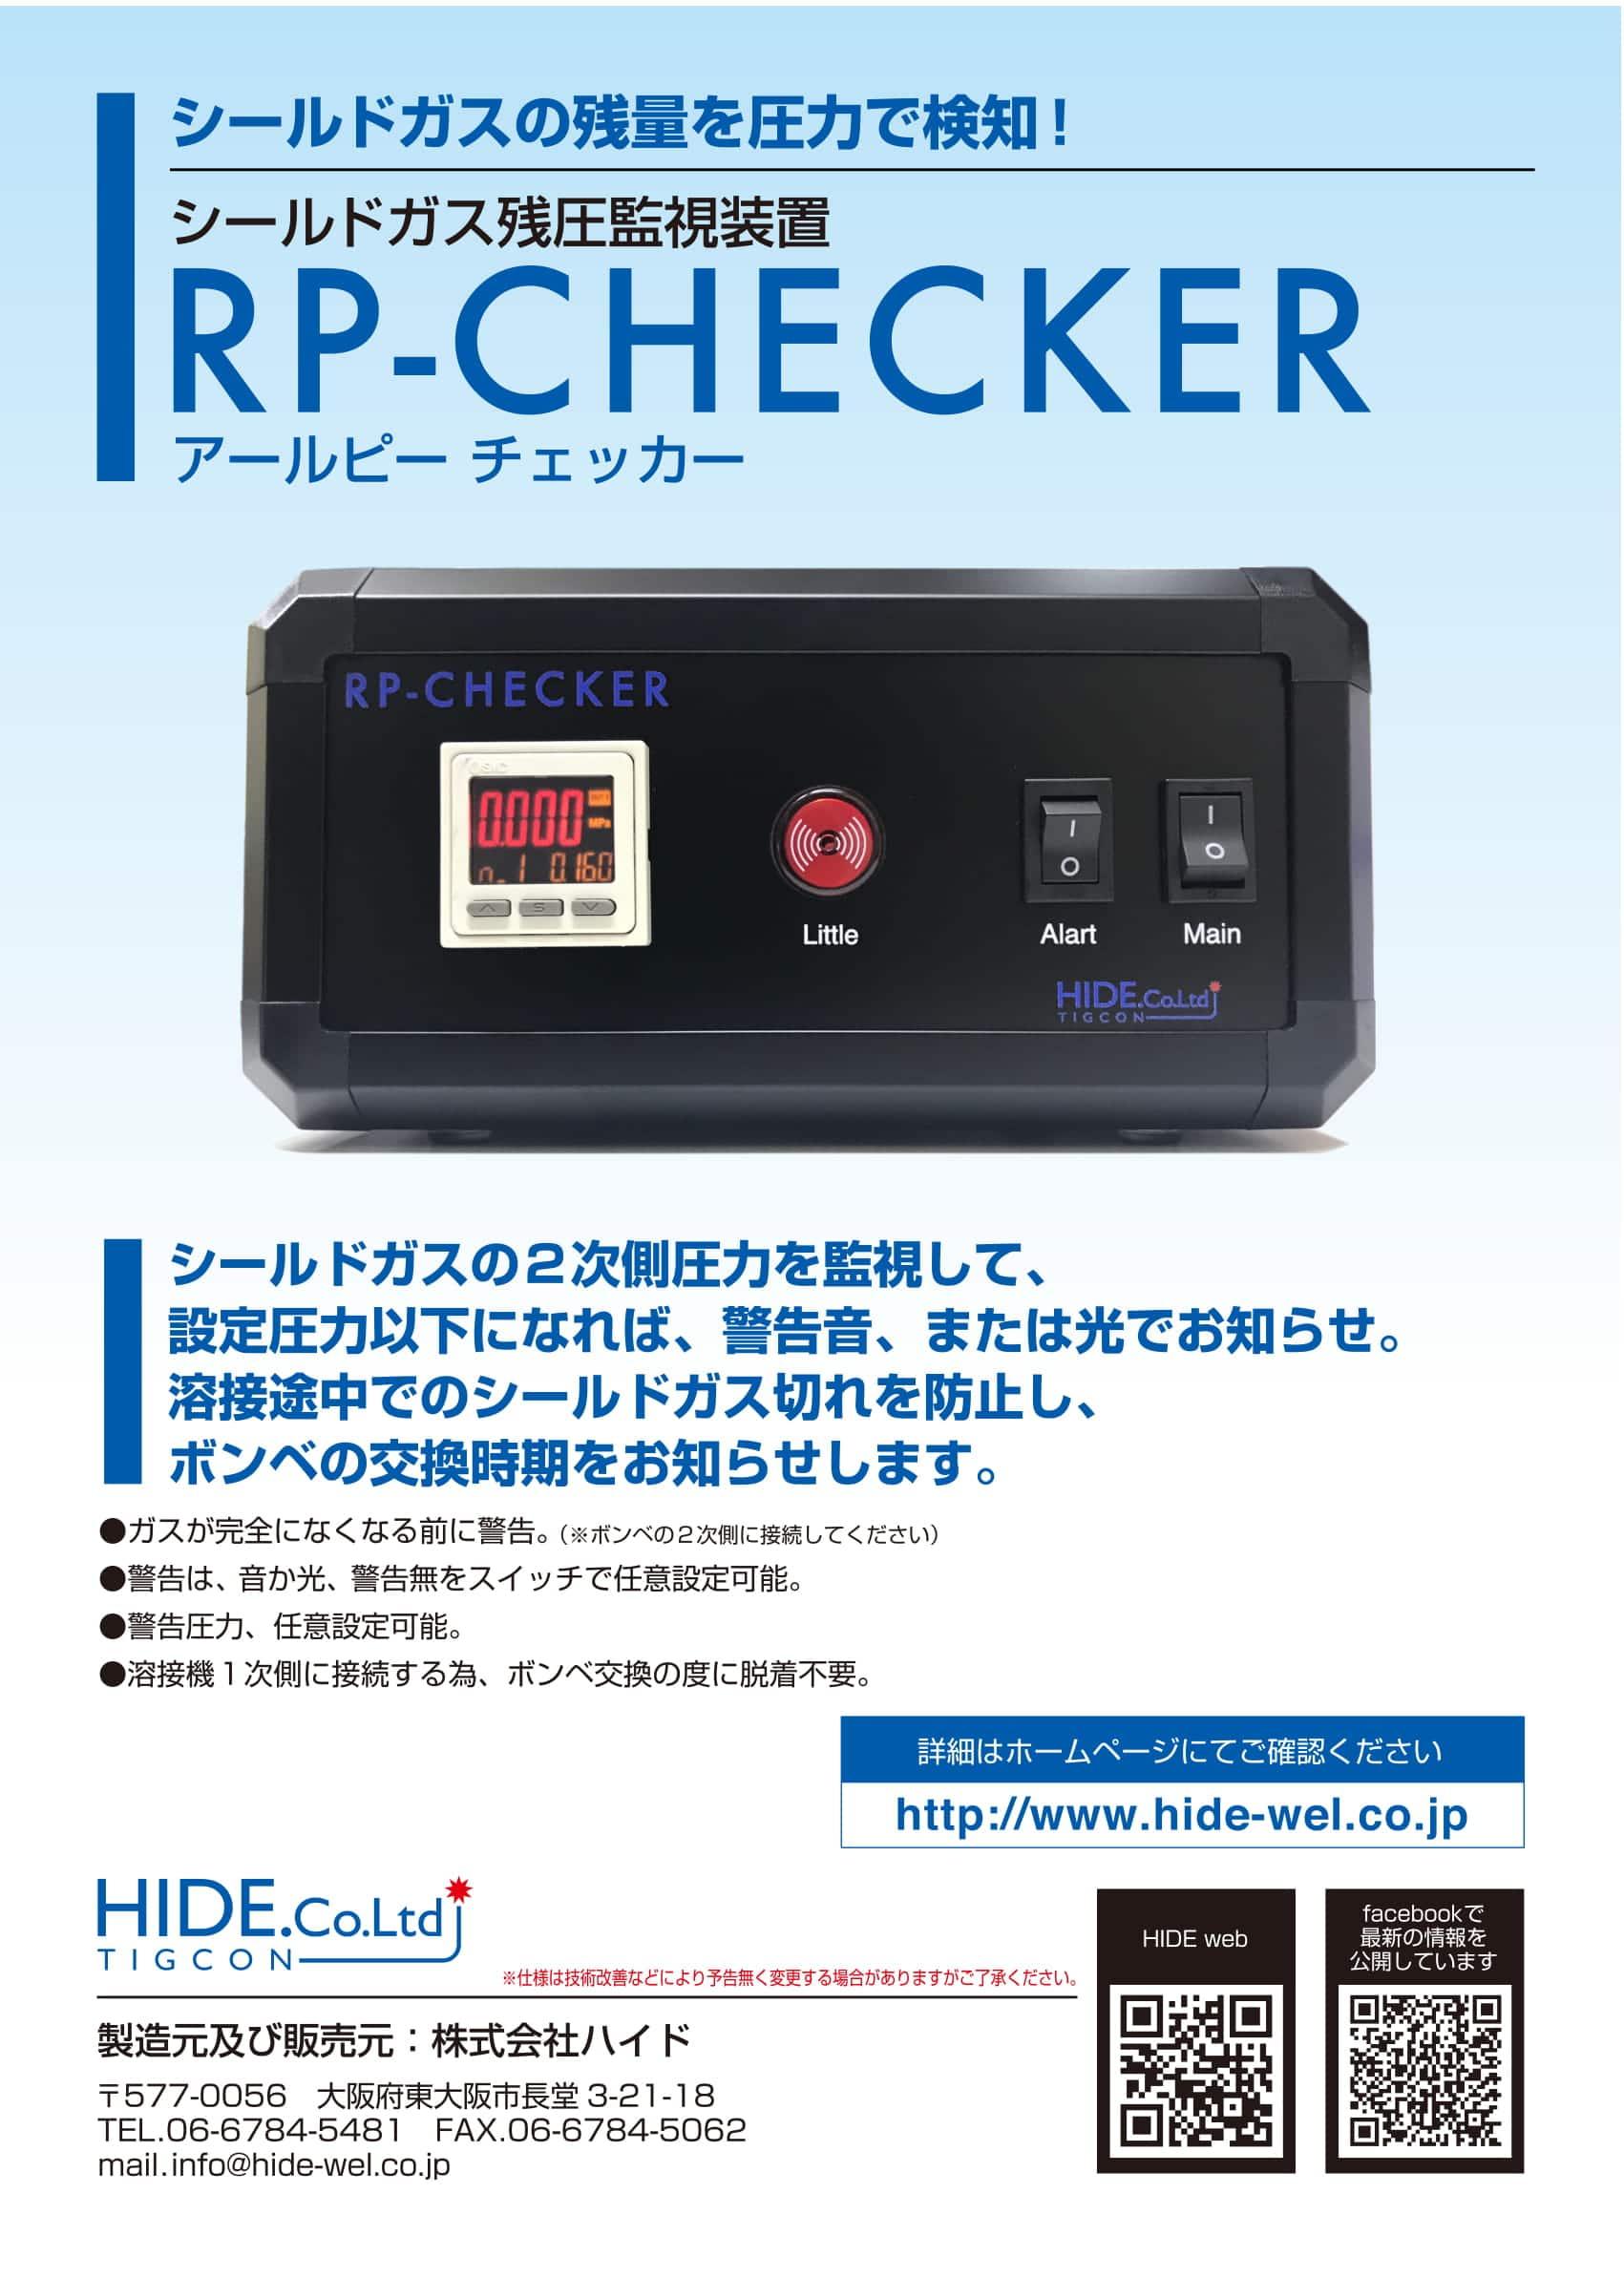 RP-CHECKER